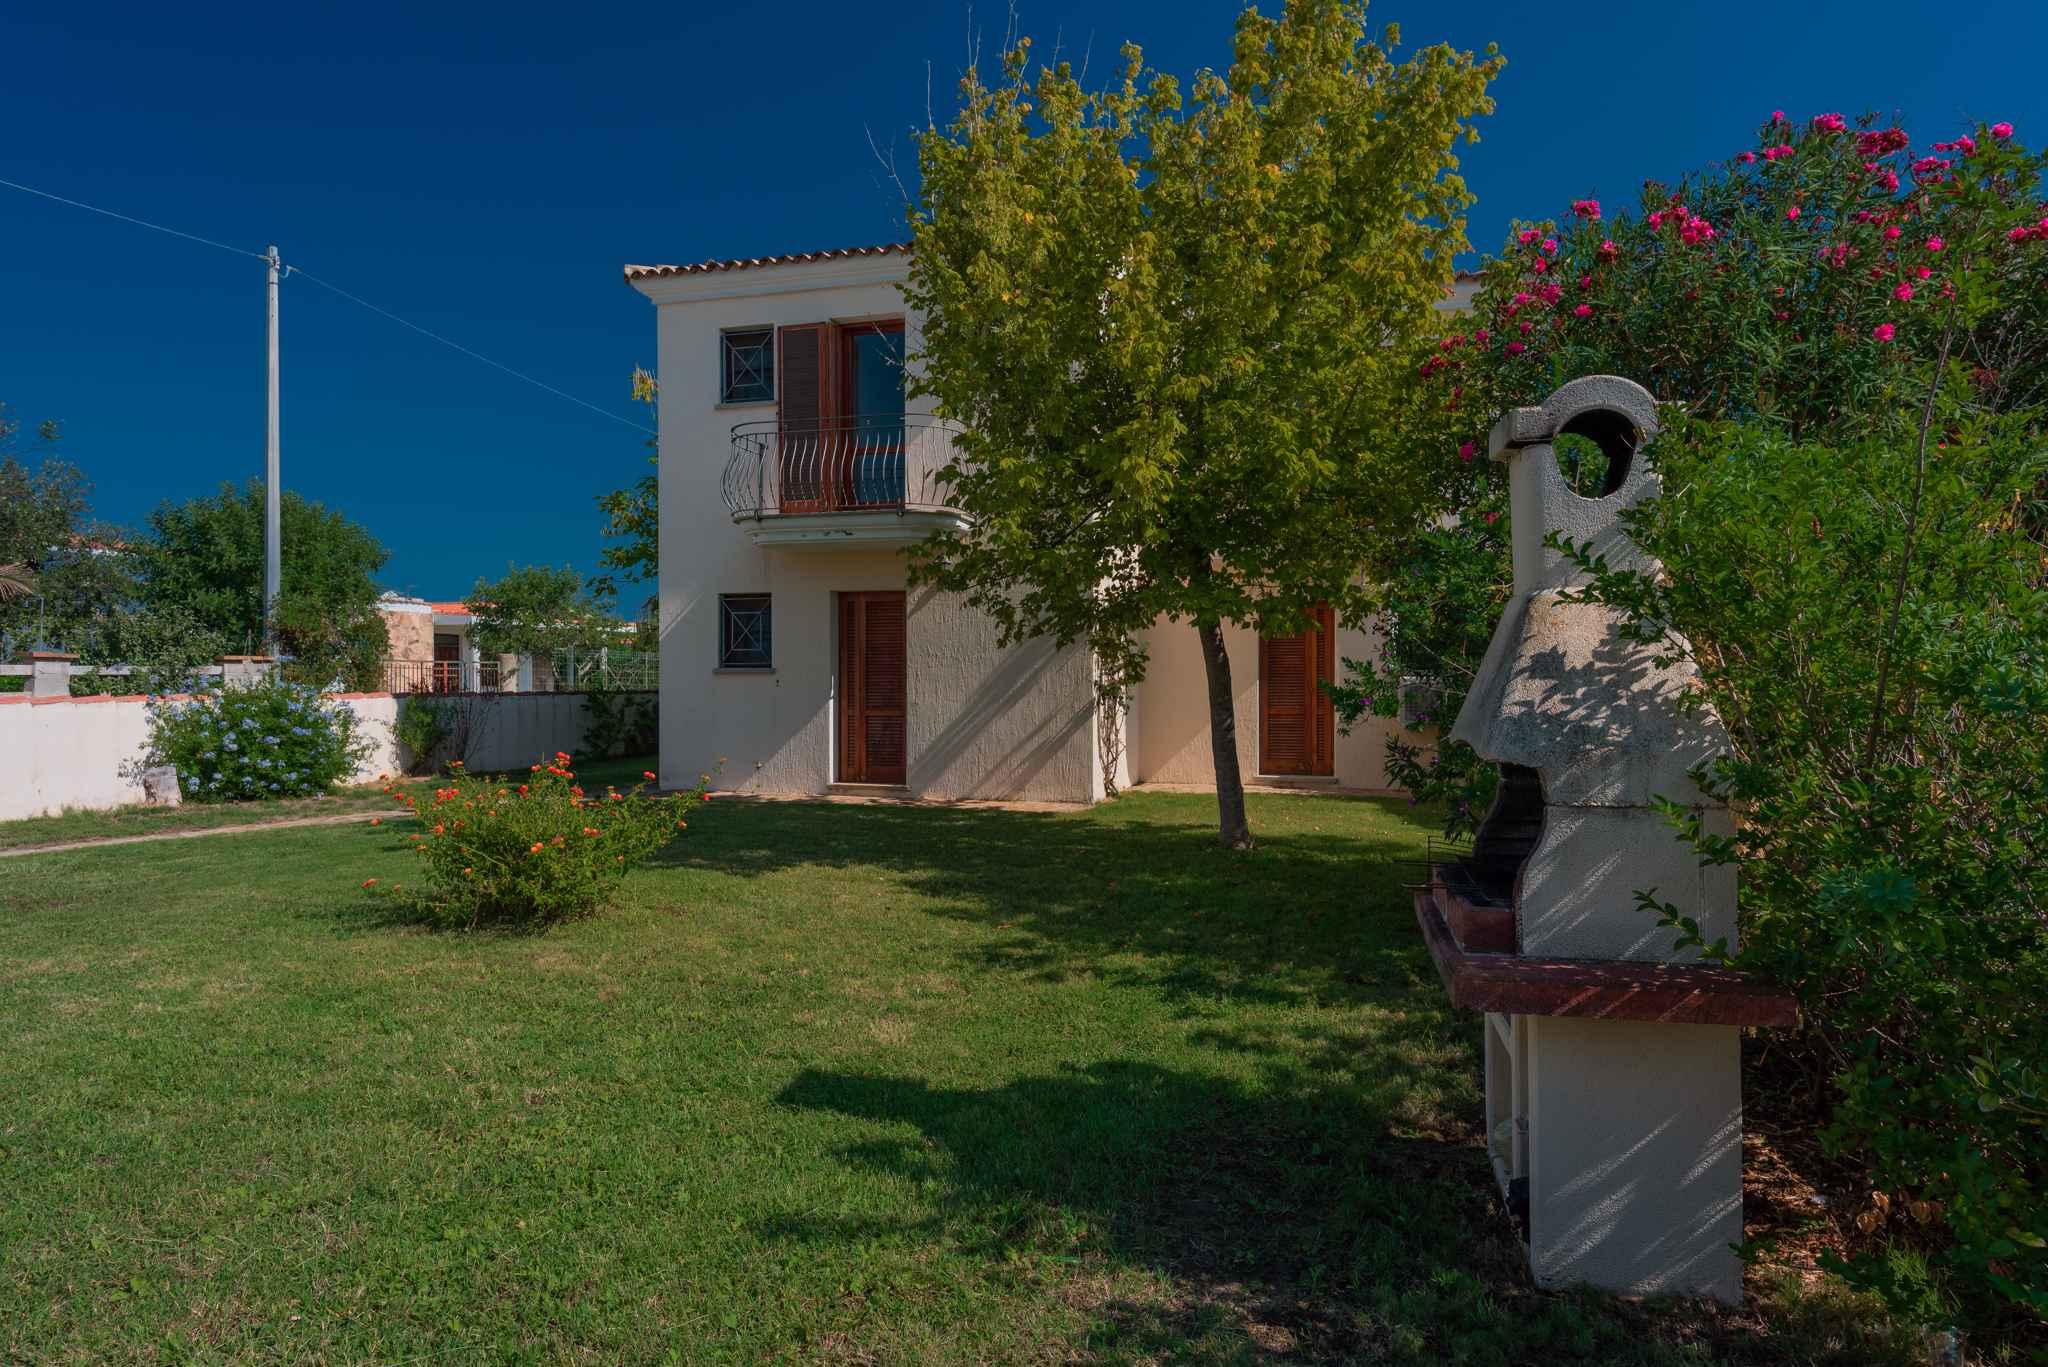 Ferienwohnung Appartamento 4 persone (2853260), Budoni, Olbia-Tempio, Sardinien, Italien, Bild 9